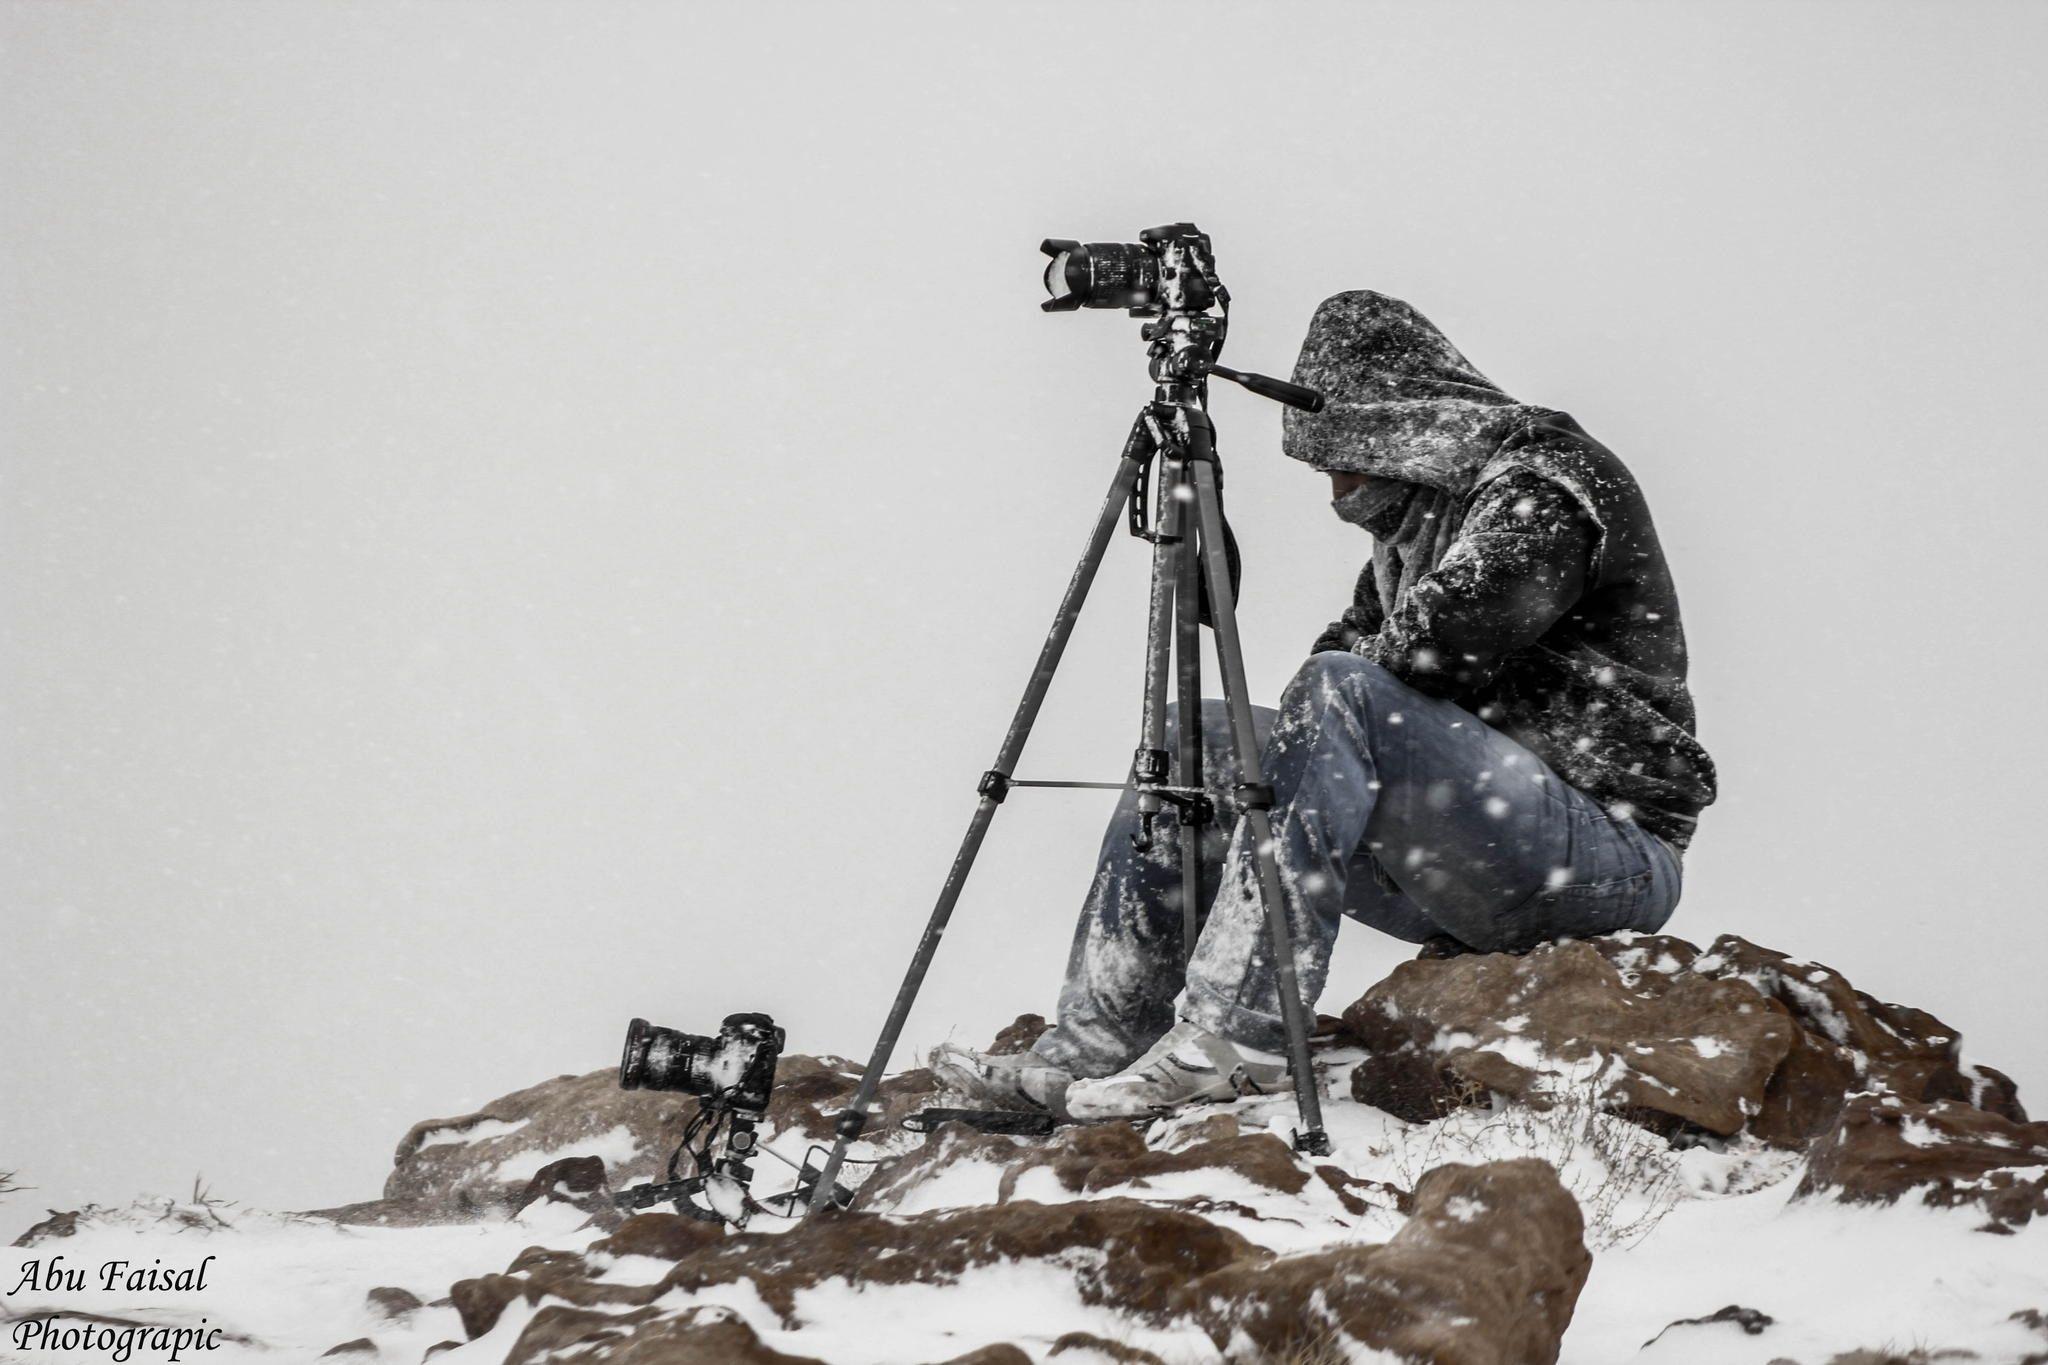 By Abu Faisal Al Anezi Funny Photography Extreme Photography Photographer